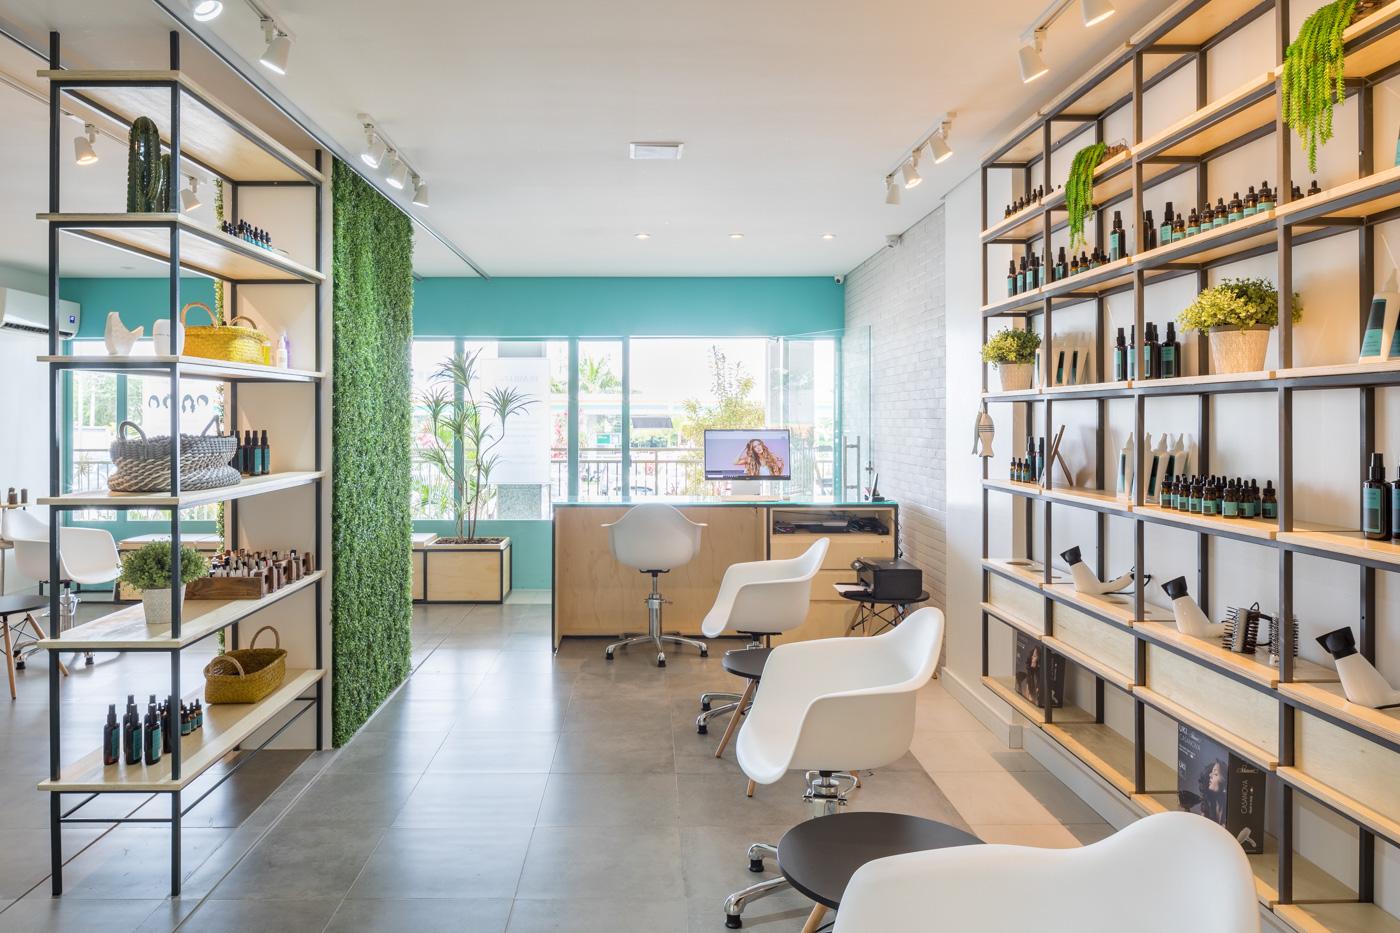 Estúdio-Mova-arquitetura-interiores-comercial-foto-haruo-mikami_147-HDR_Baixa.jpg